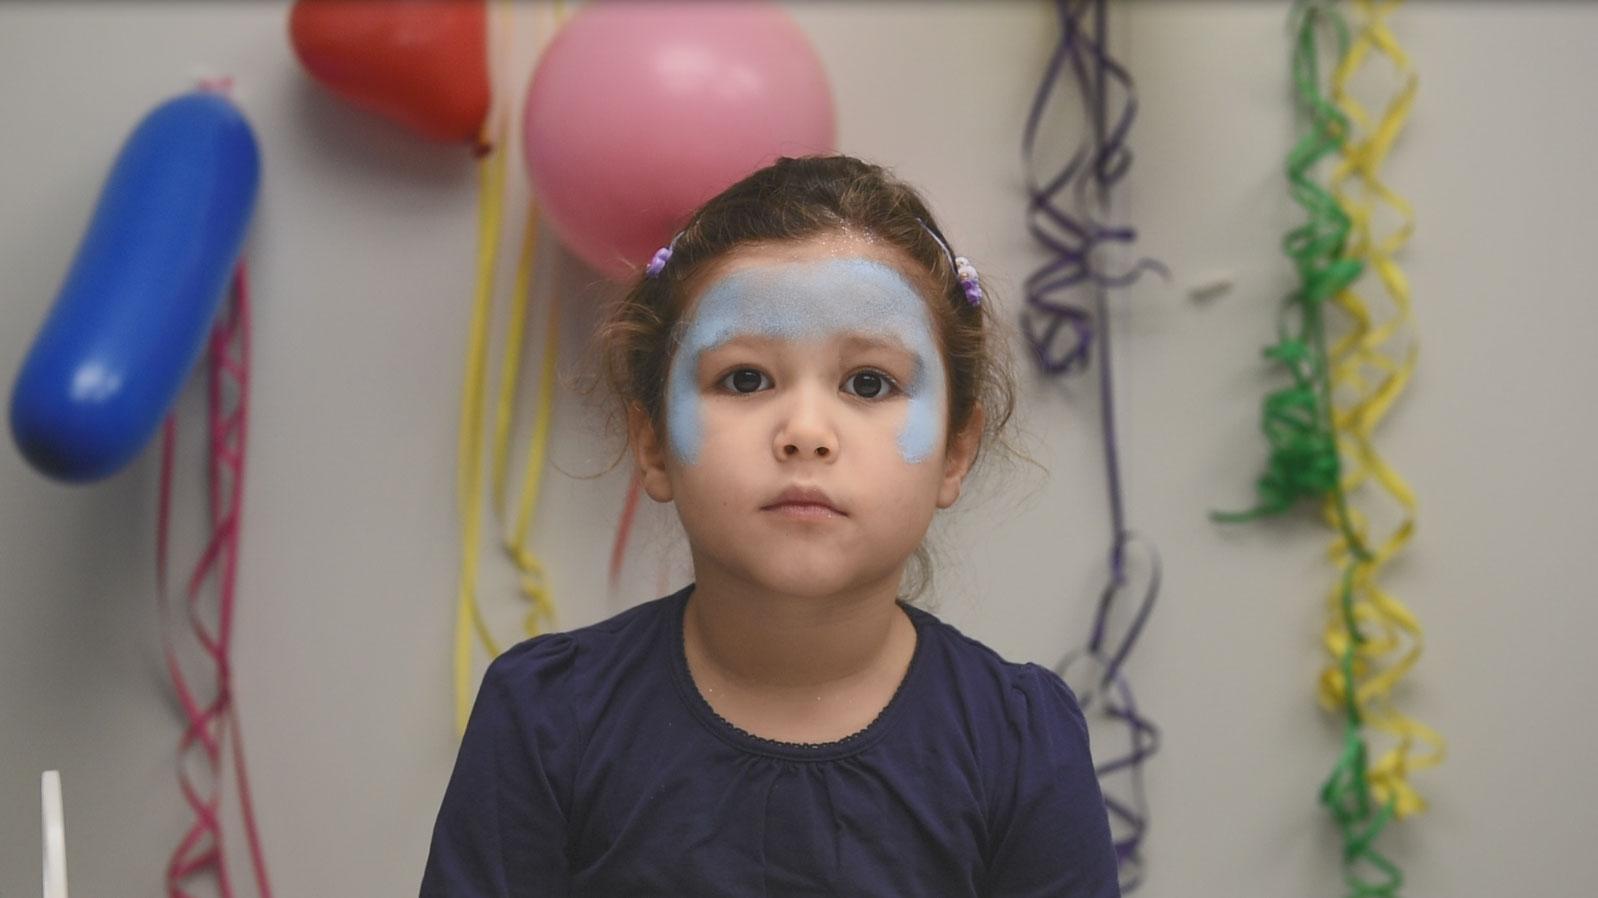 Videoanleitung Kinderschminken Eiskonigin Famigros